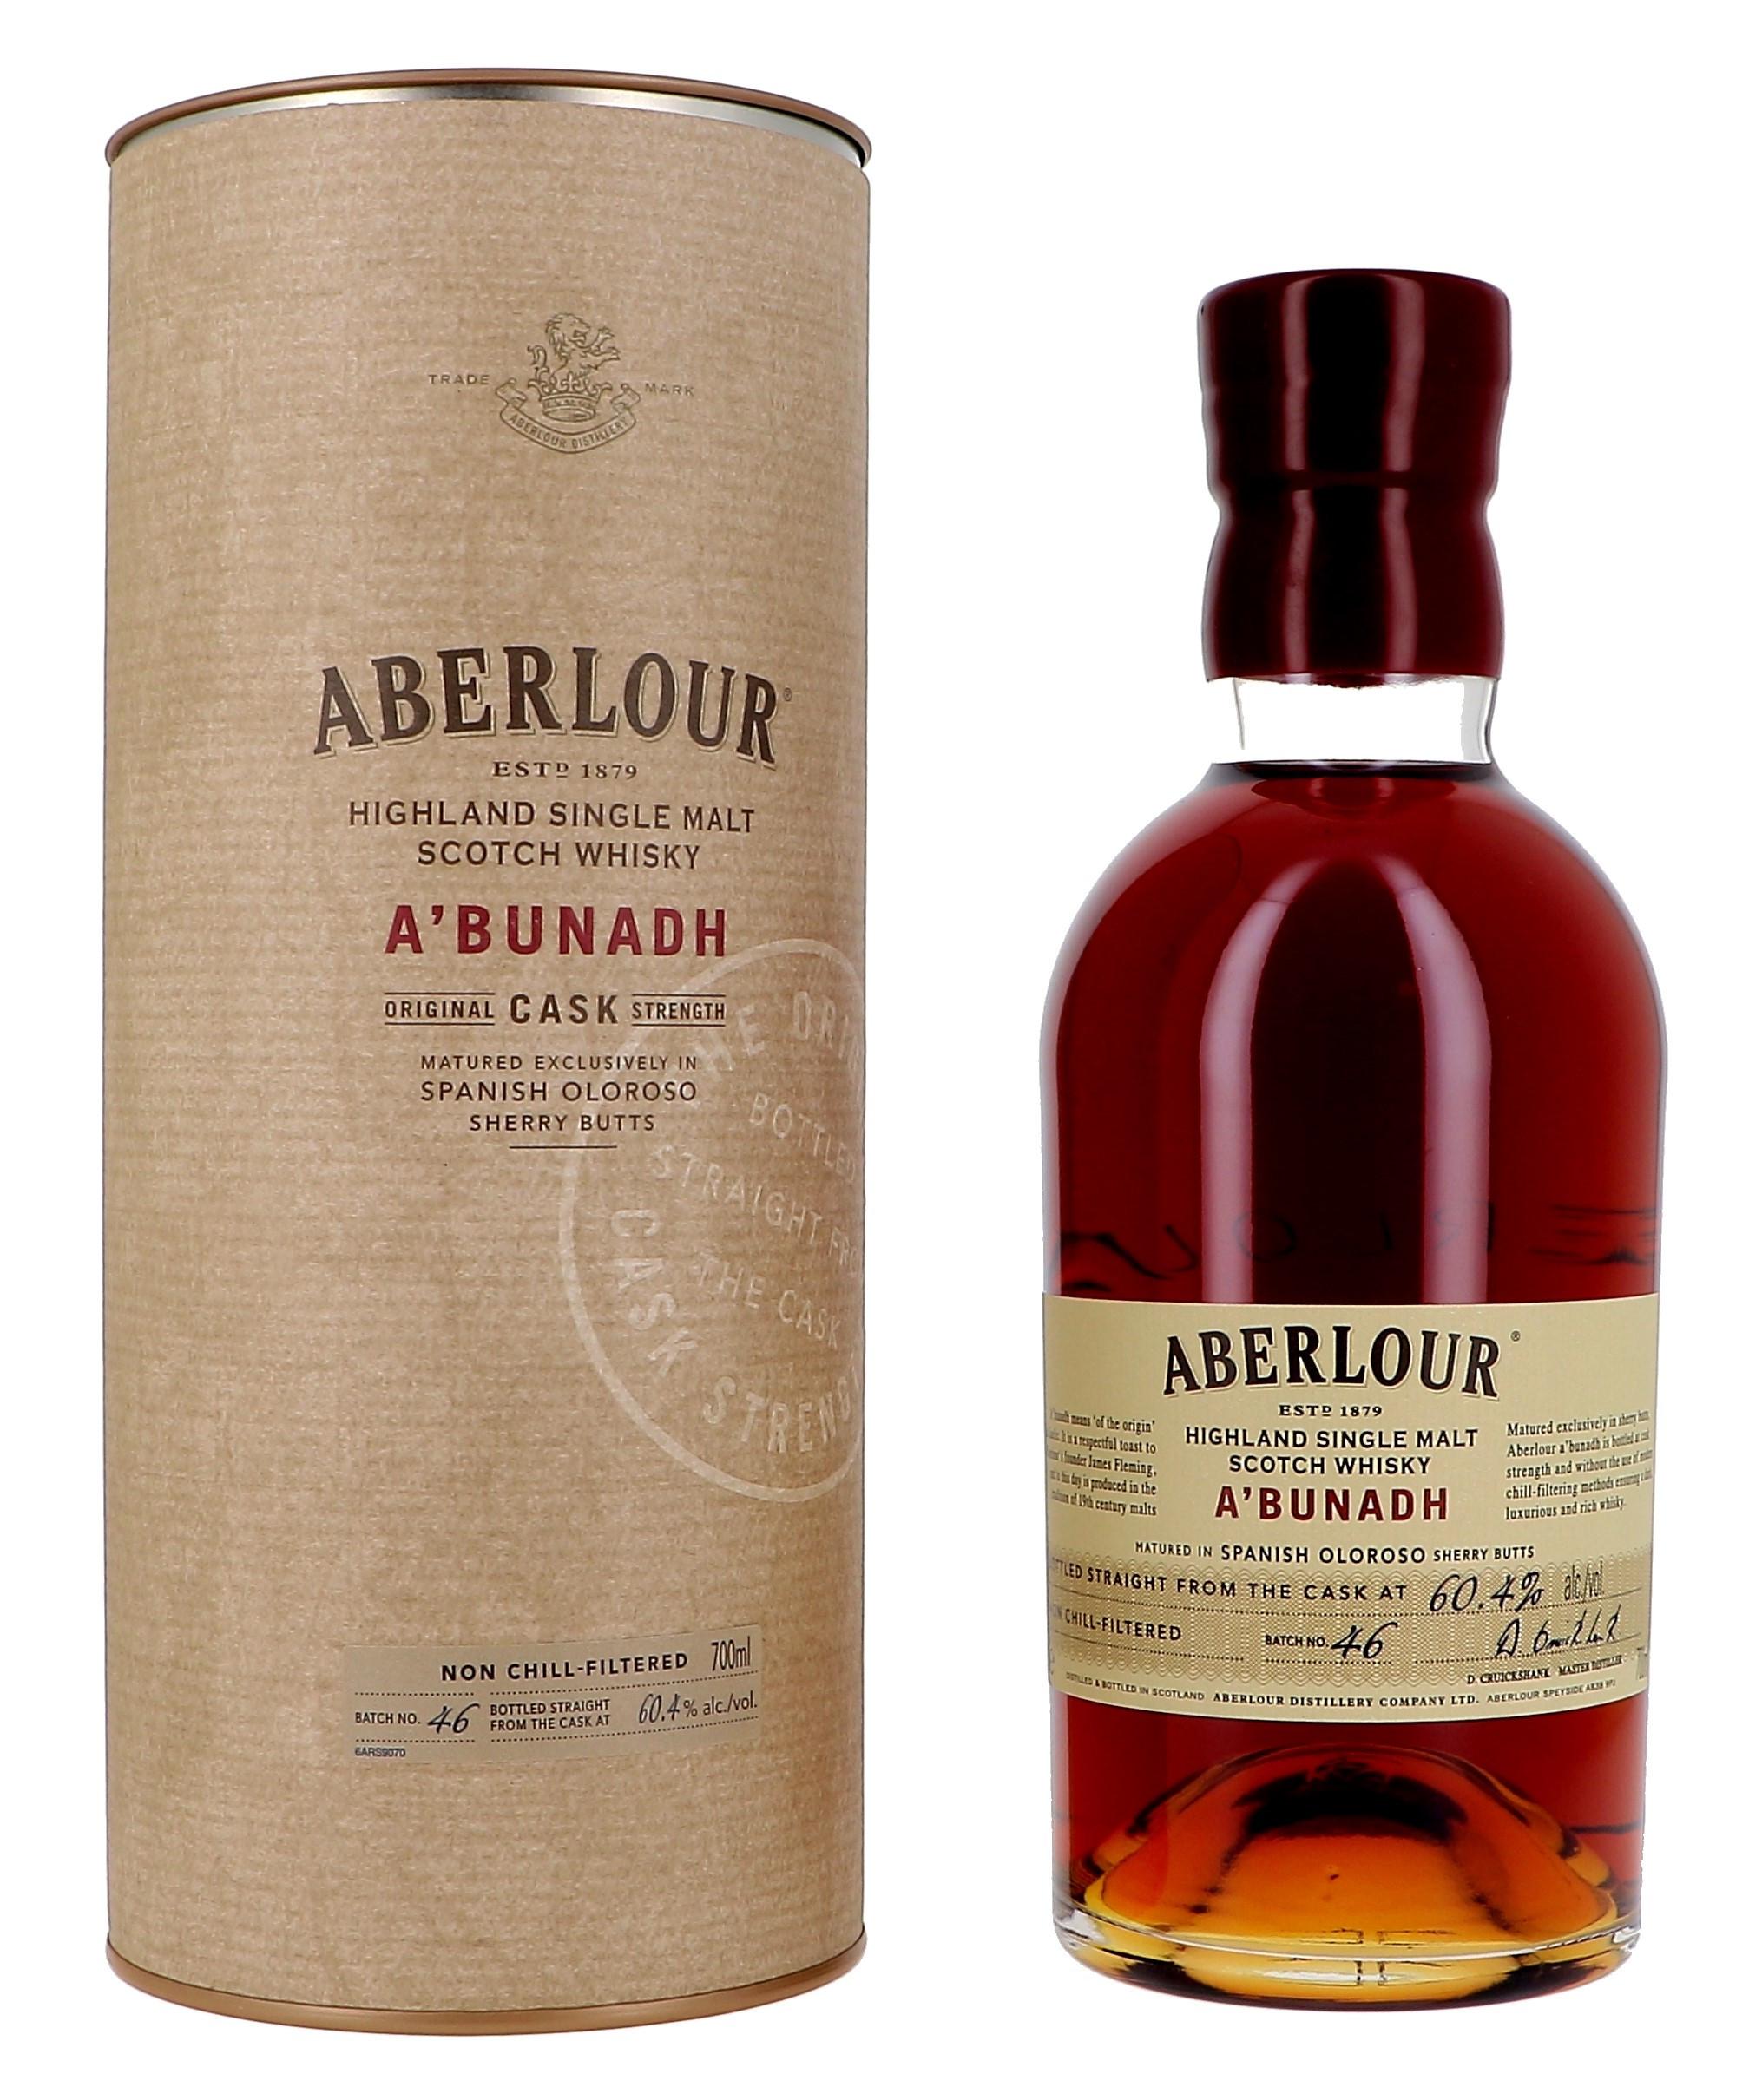 Aberlour A'Bunadh Cask Strenght 70cl 59.6% Highland Single Malt Scotch Whisky (Whisky)